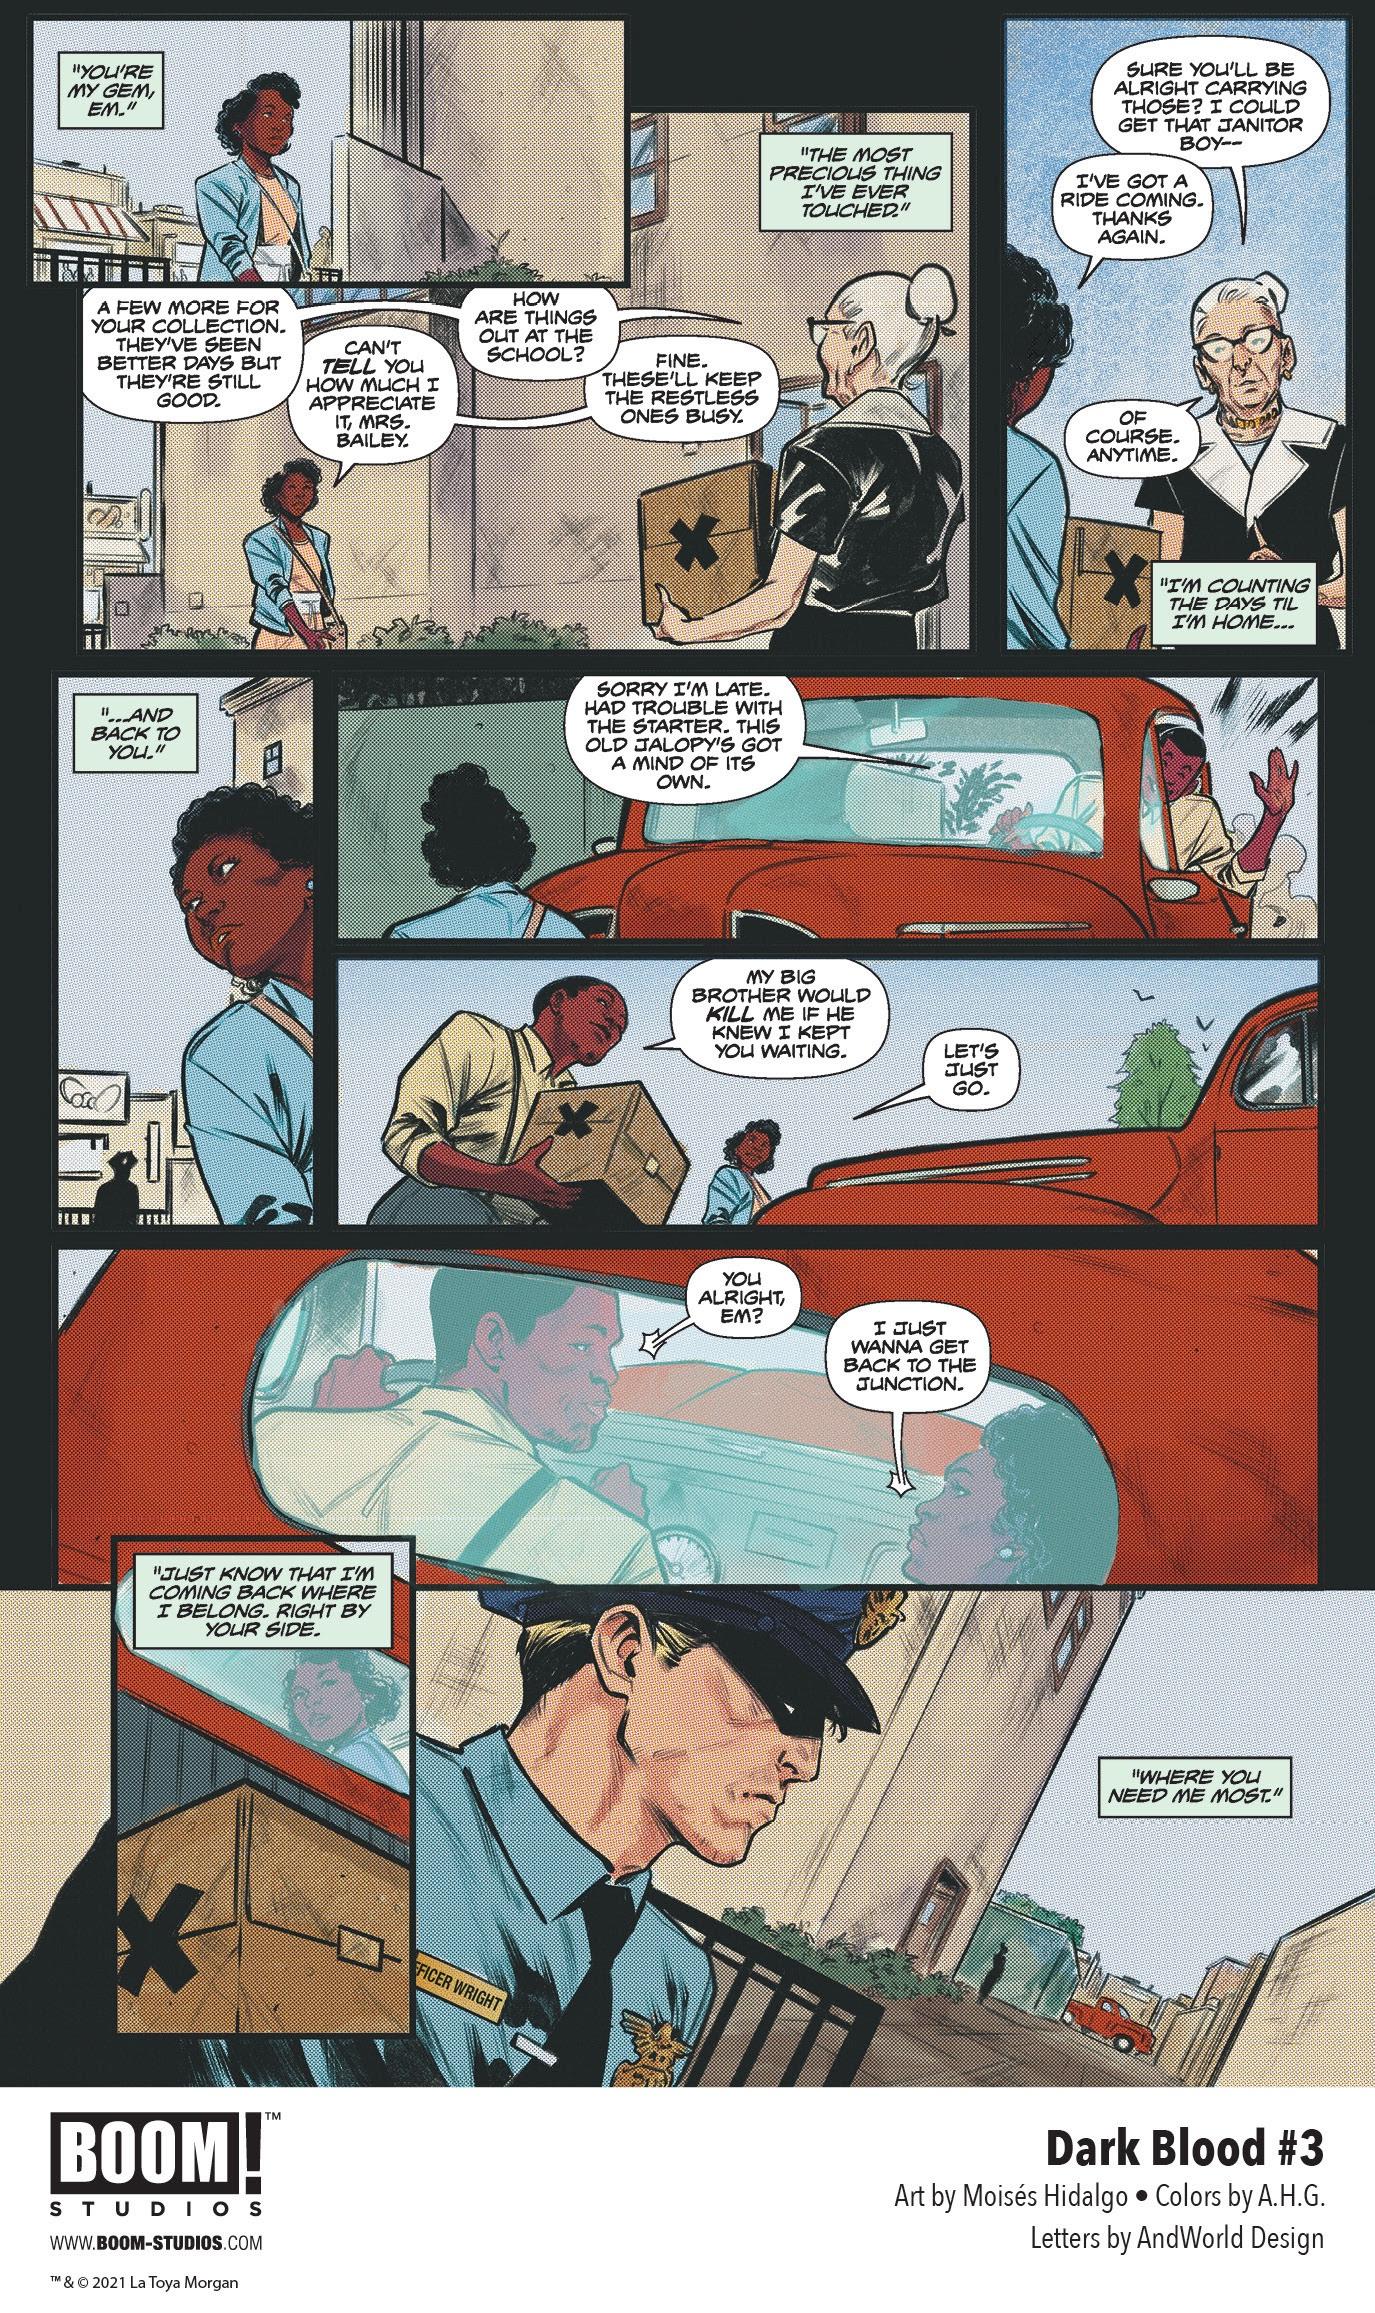 , Painful Memories Resurface in LaToya Morgan's DARK BLOOD #3, The Indie Comix Dispatch